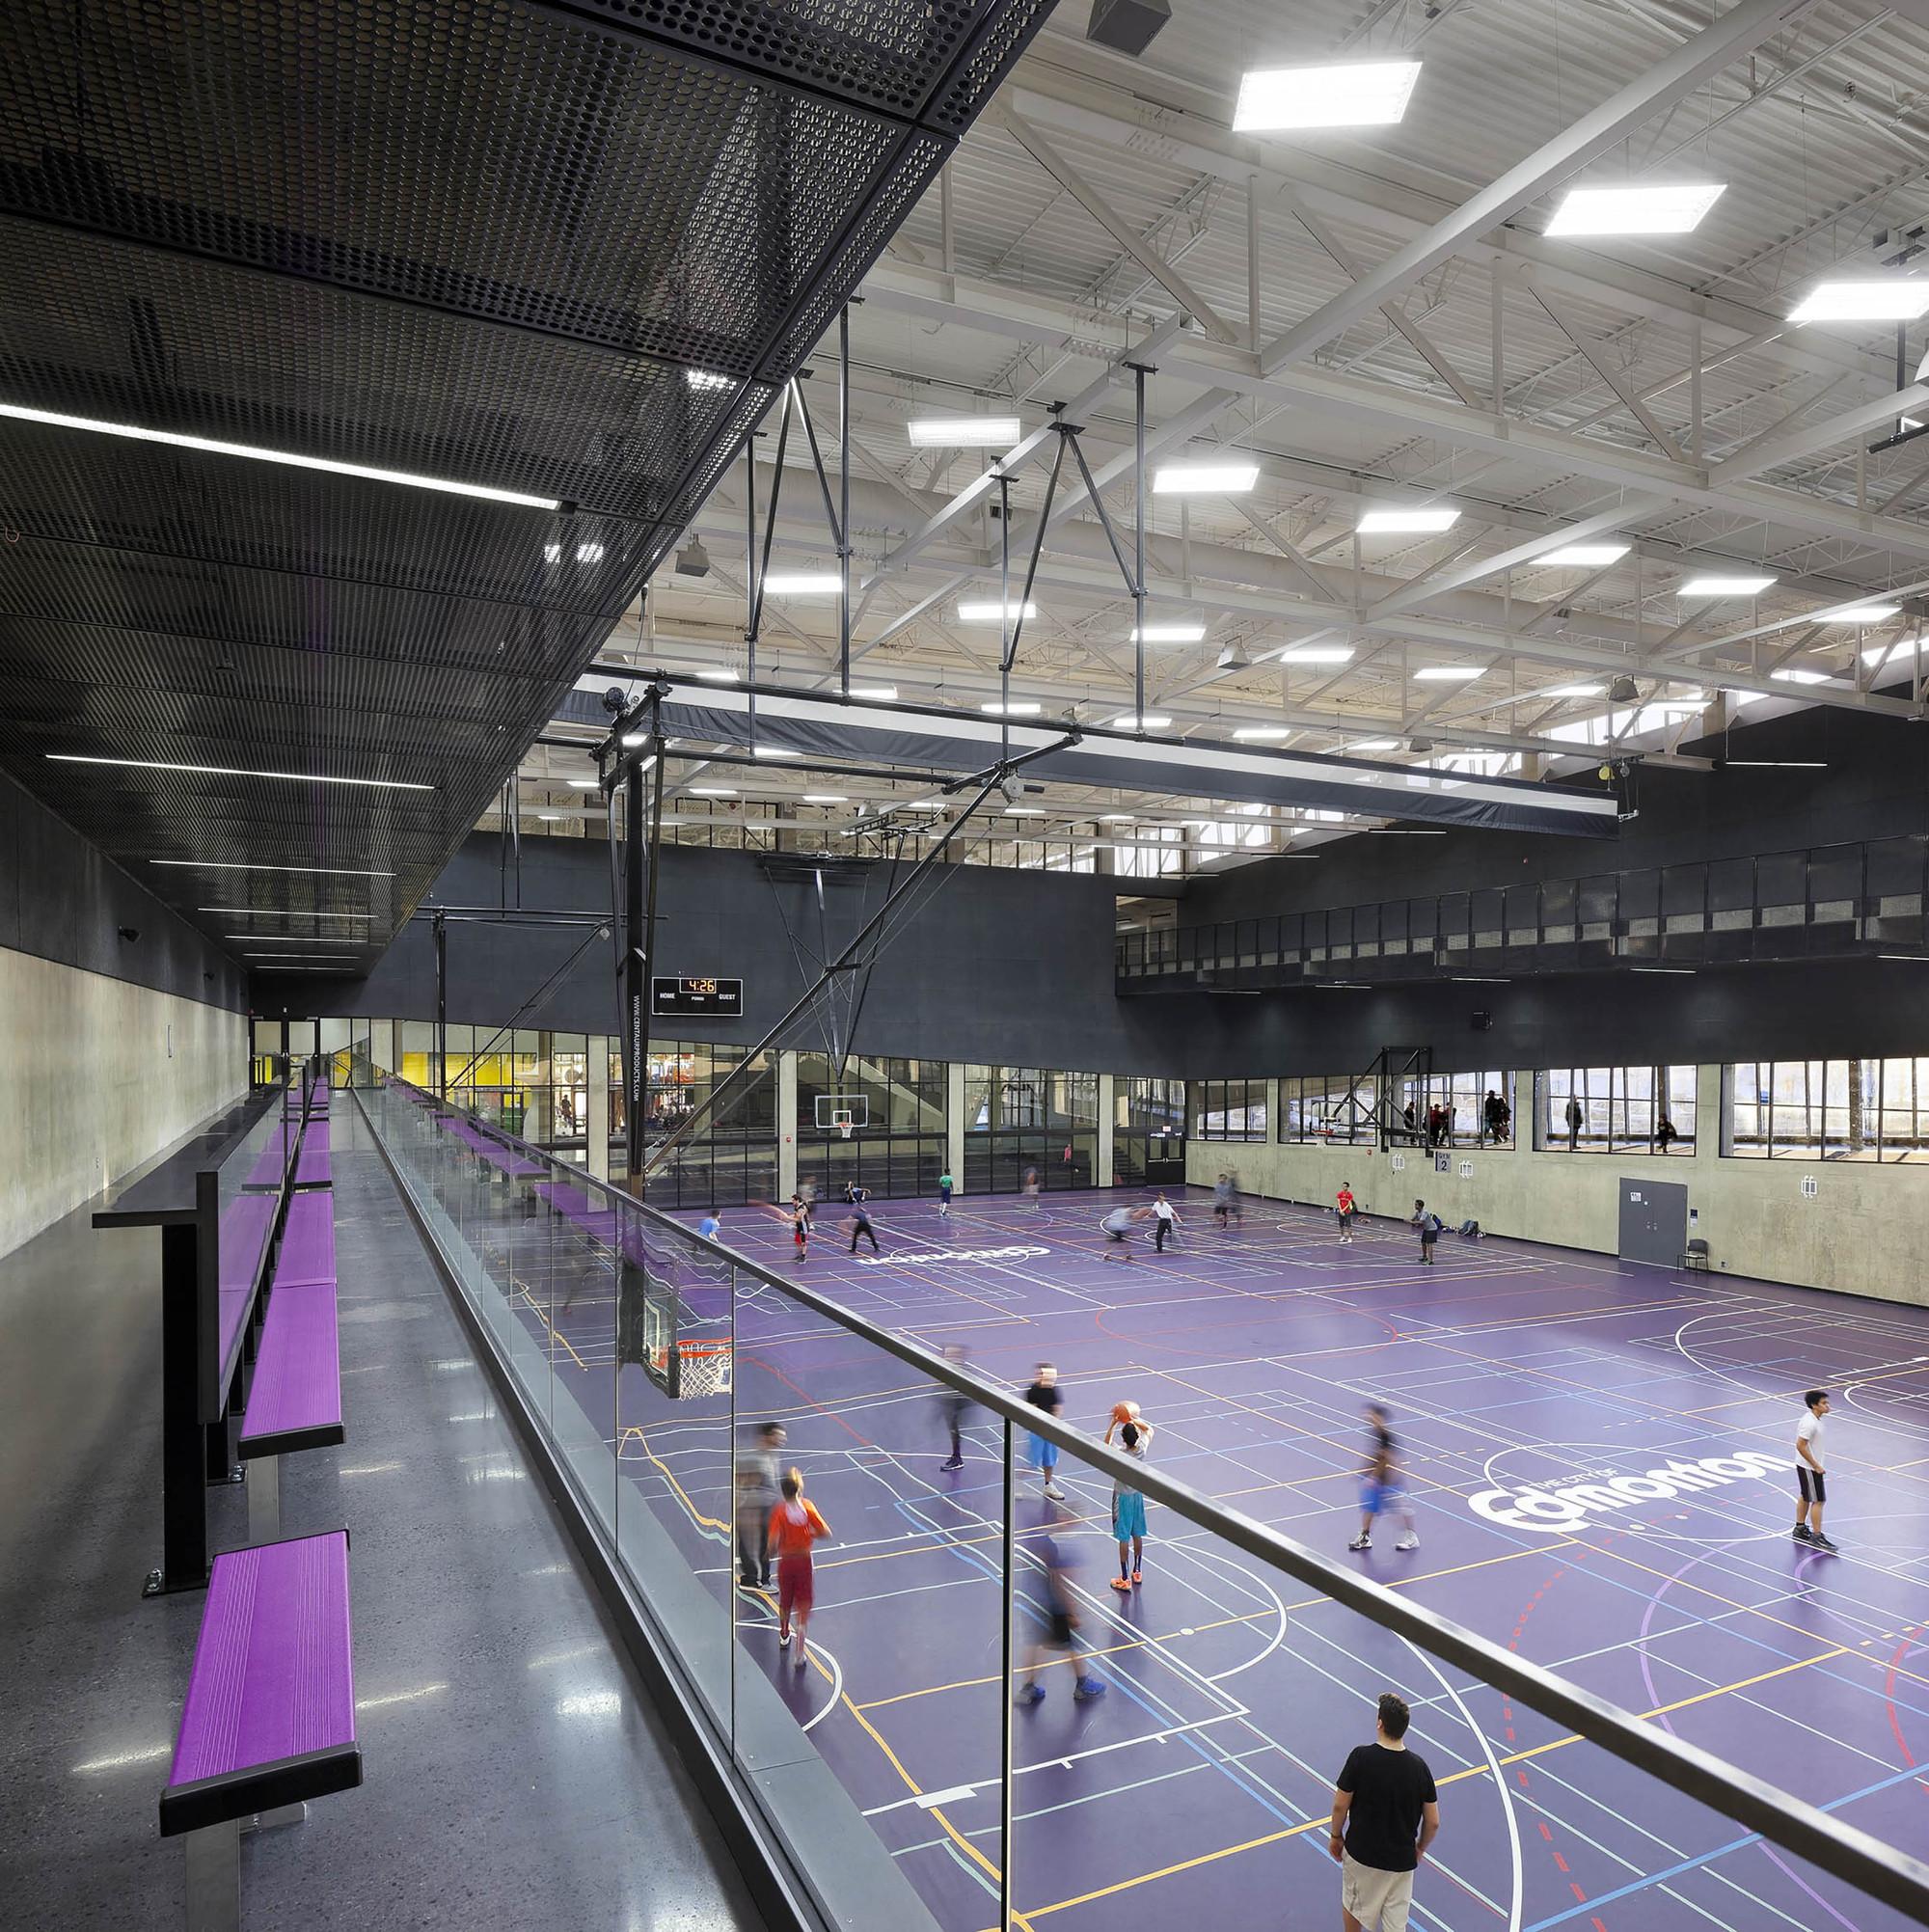 Centro recreativo comunitario Clareview / Teeple Architects